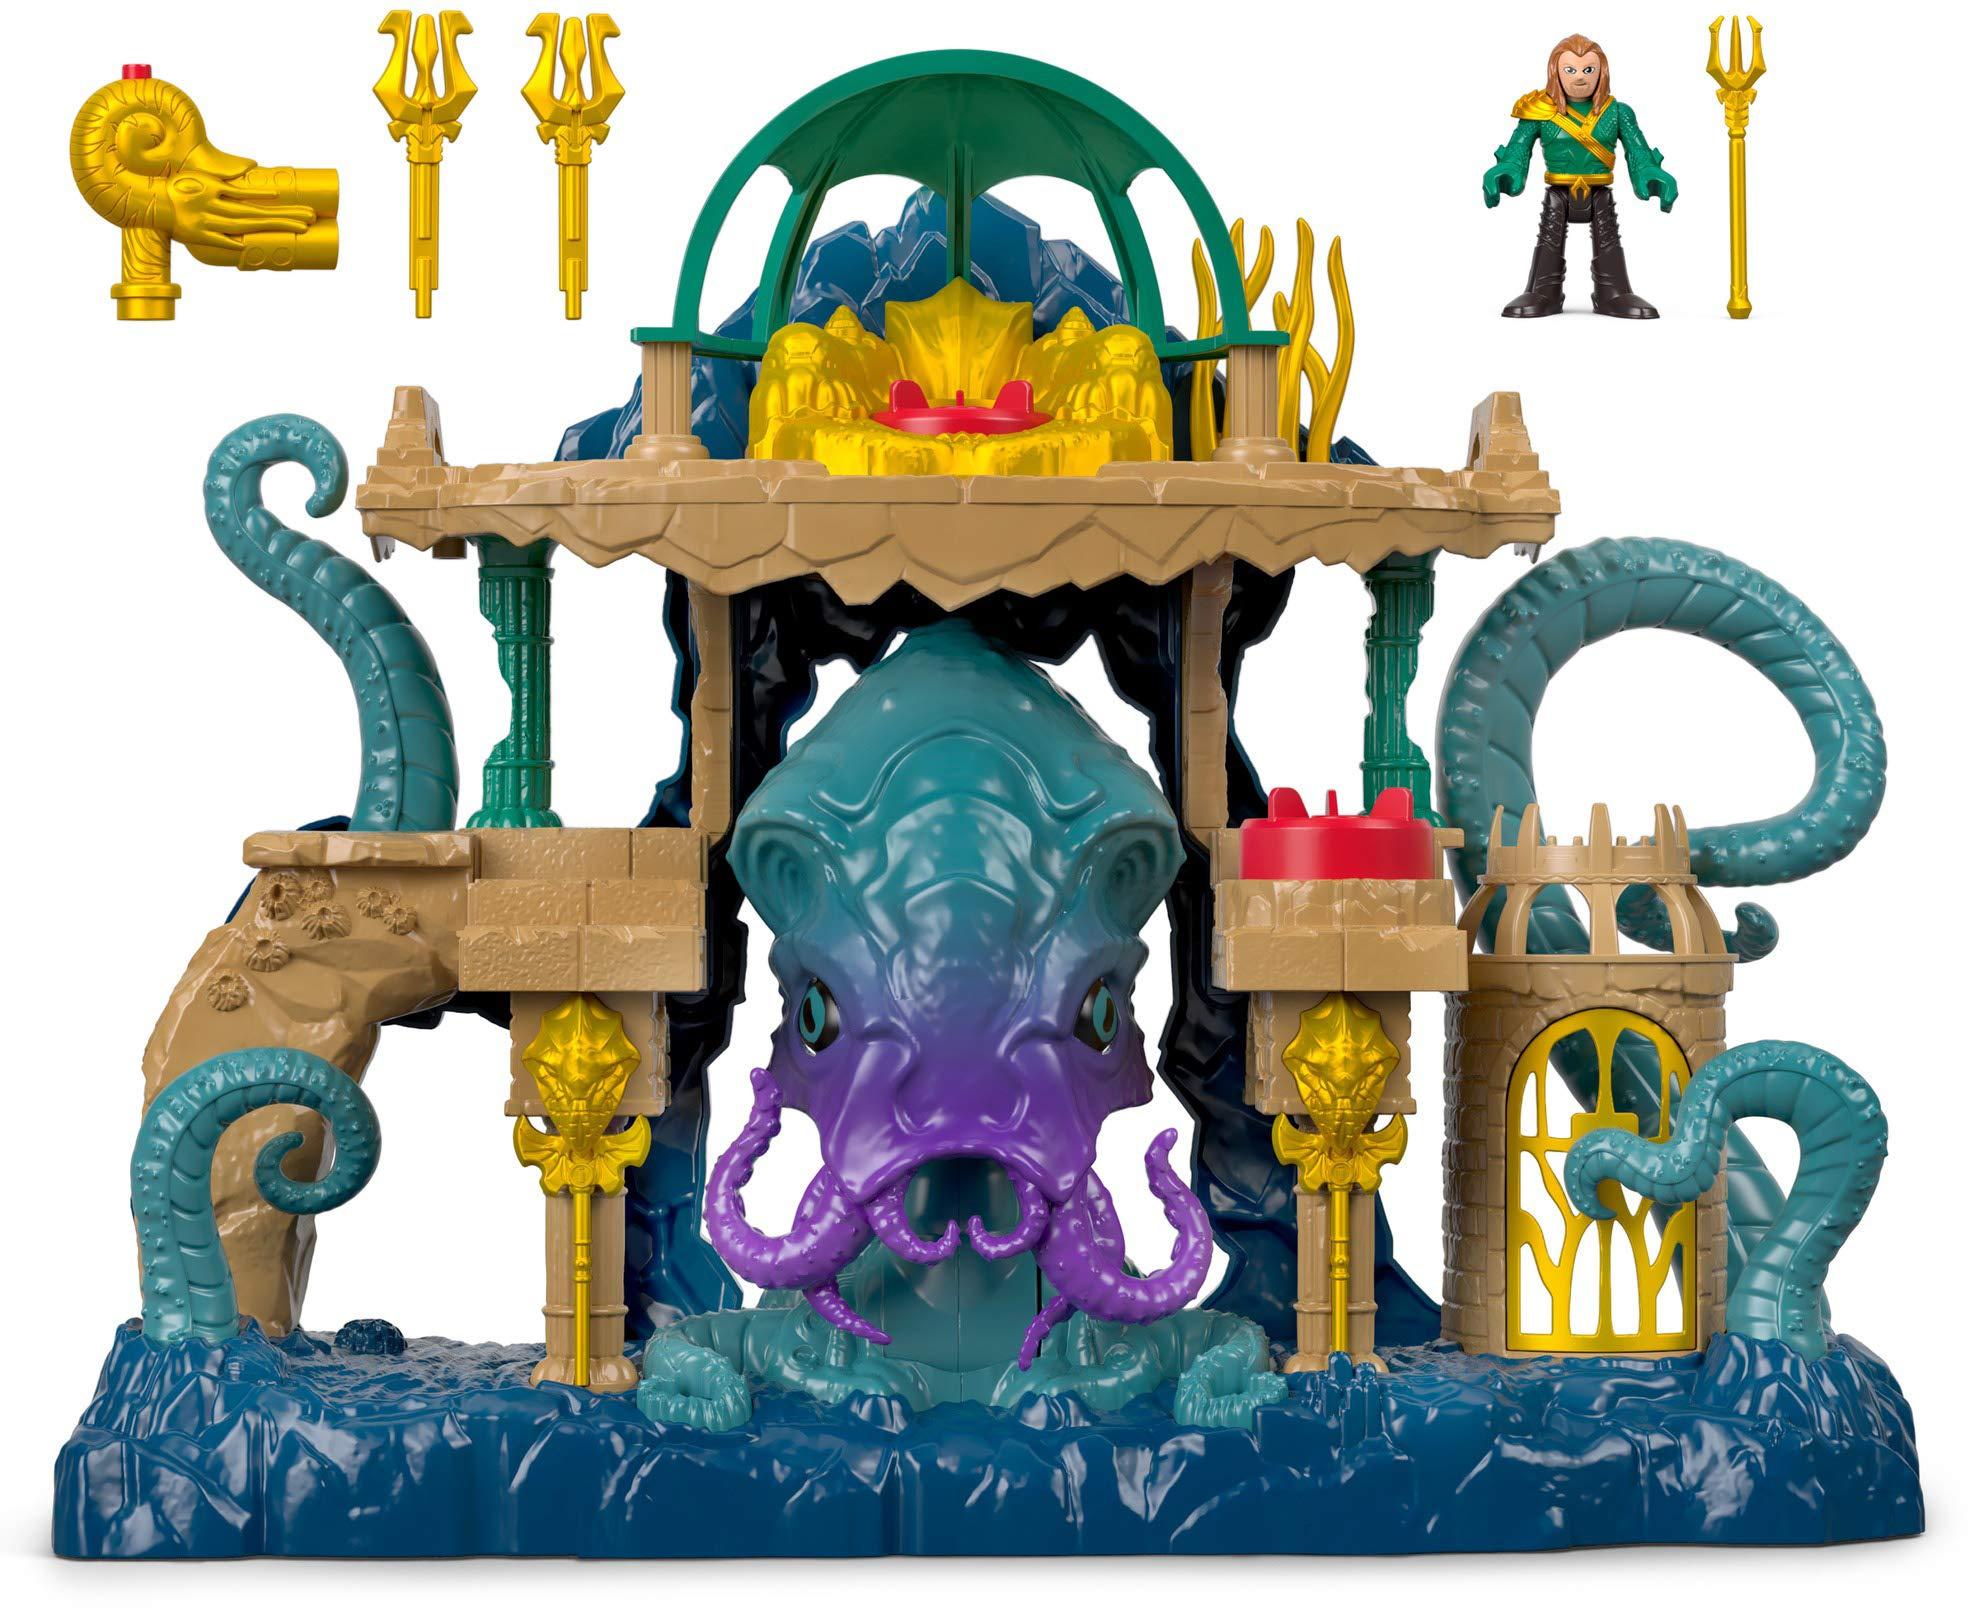 Fisher-Price Imaginext DC Super Friends Aquaman Playset